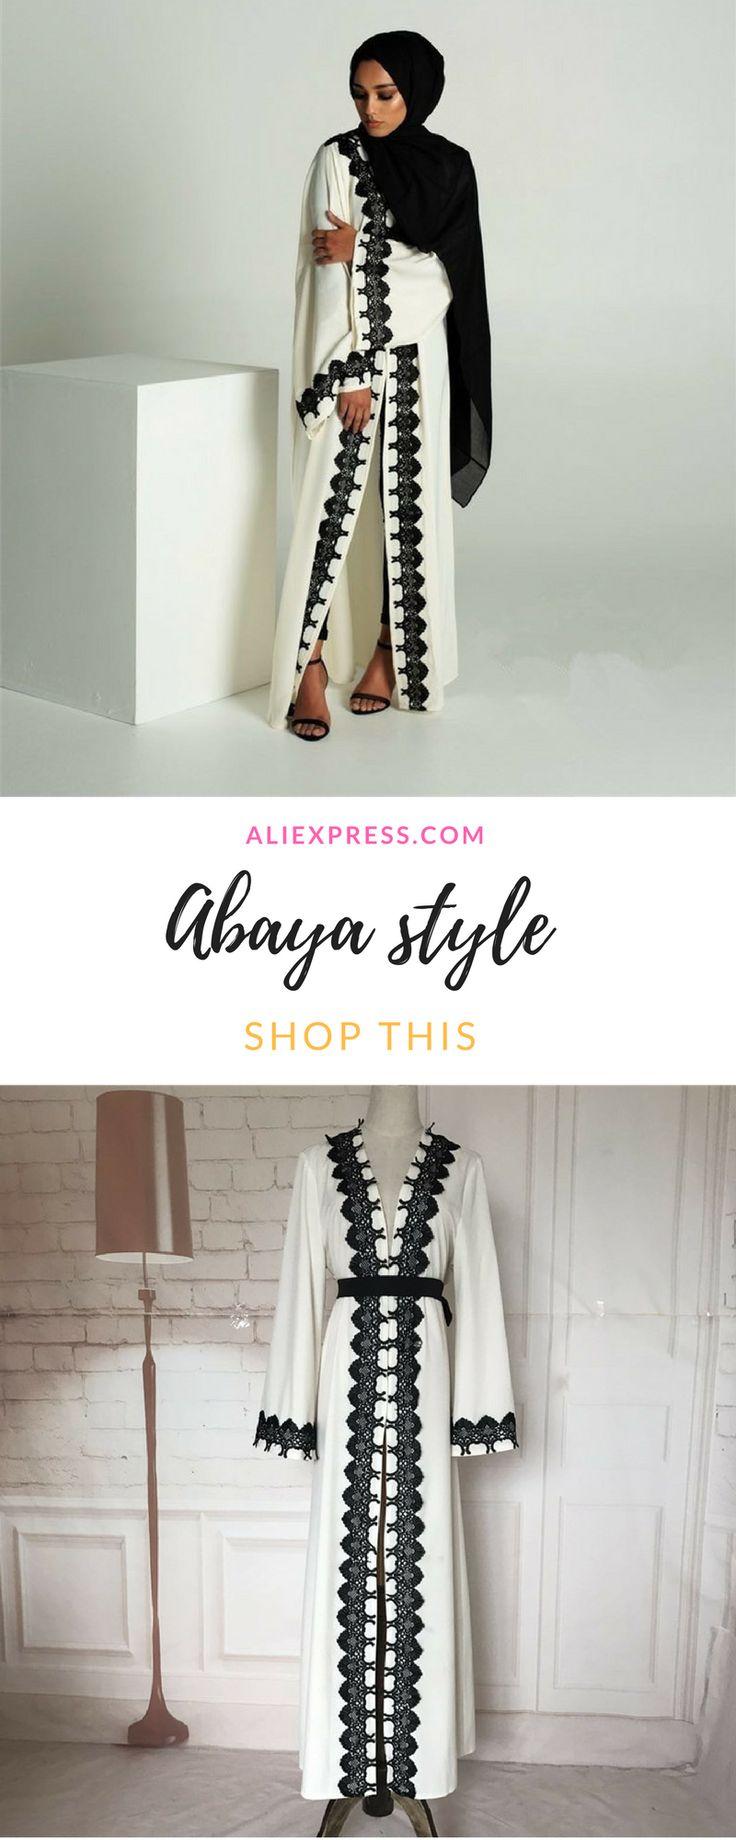 hijab outfits - #hijab #hijabfashion #hijabstyle #hijabista #hijaboutfit #abaya #fashion #shopping #aliexpress #affiliate #afflink #affiliatelink #affiliatemarketing #affordable #fashion #casualoutfits